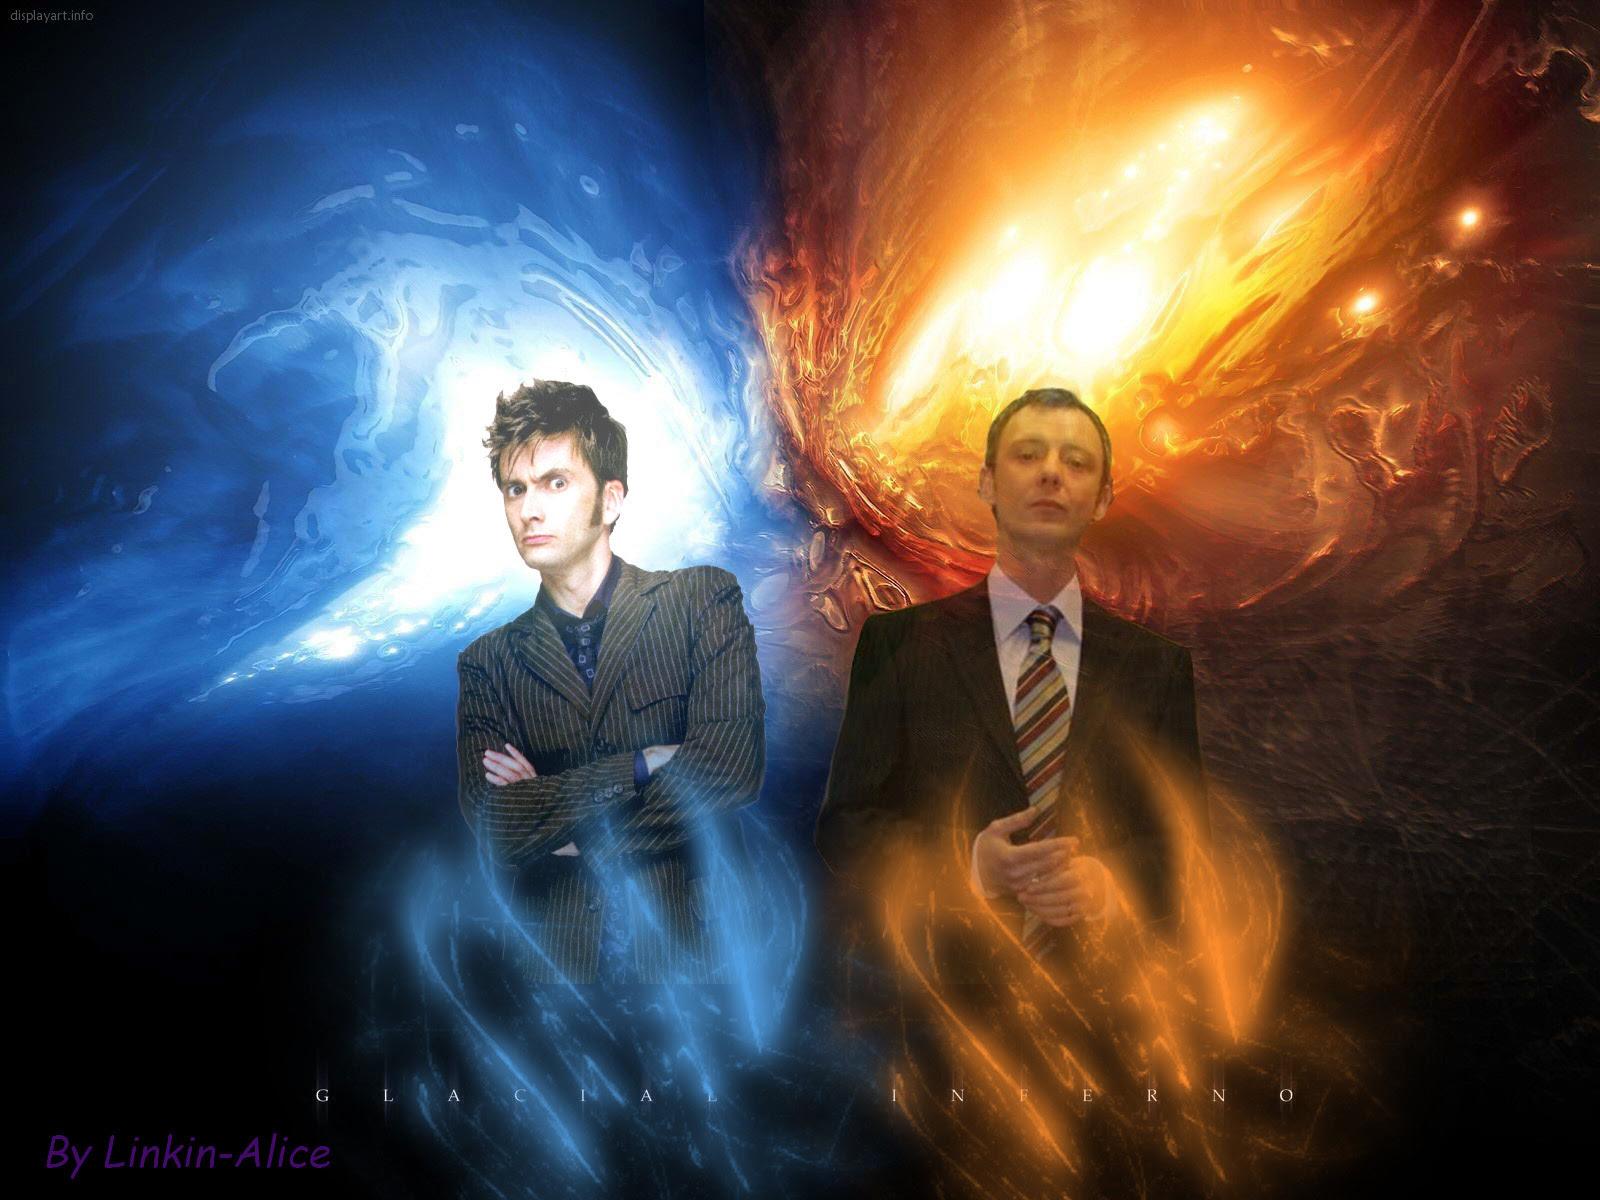 Doctor S Team Doctor Who Wallpaper 10277024 Fanpop